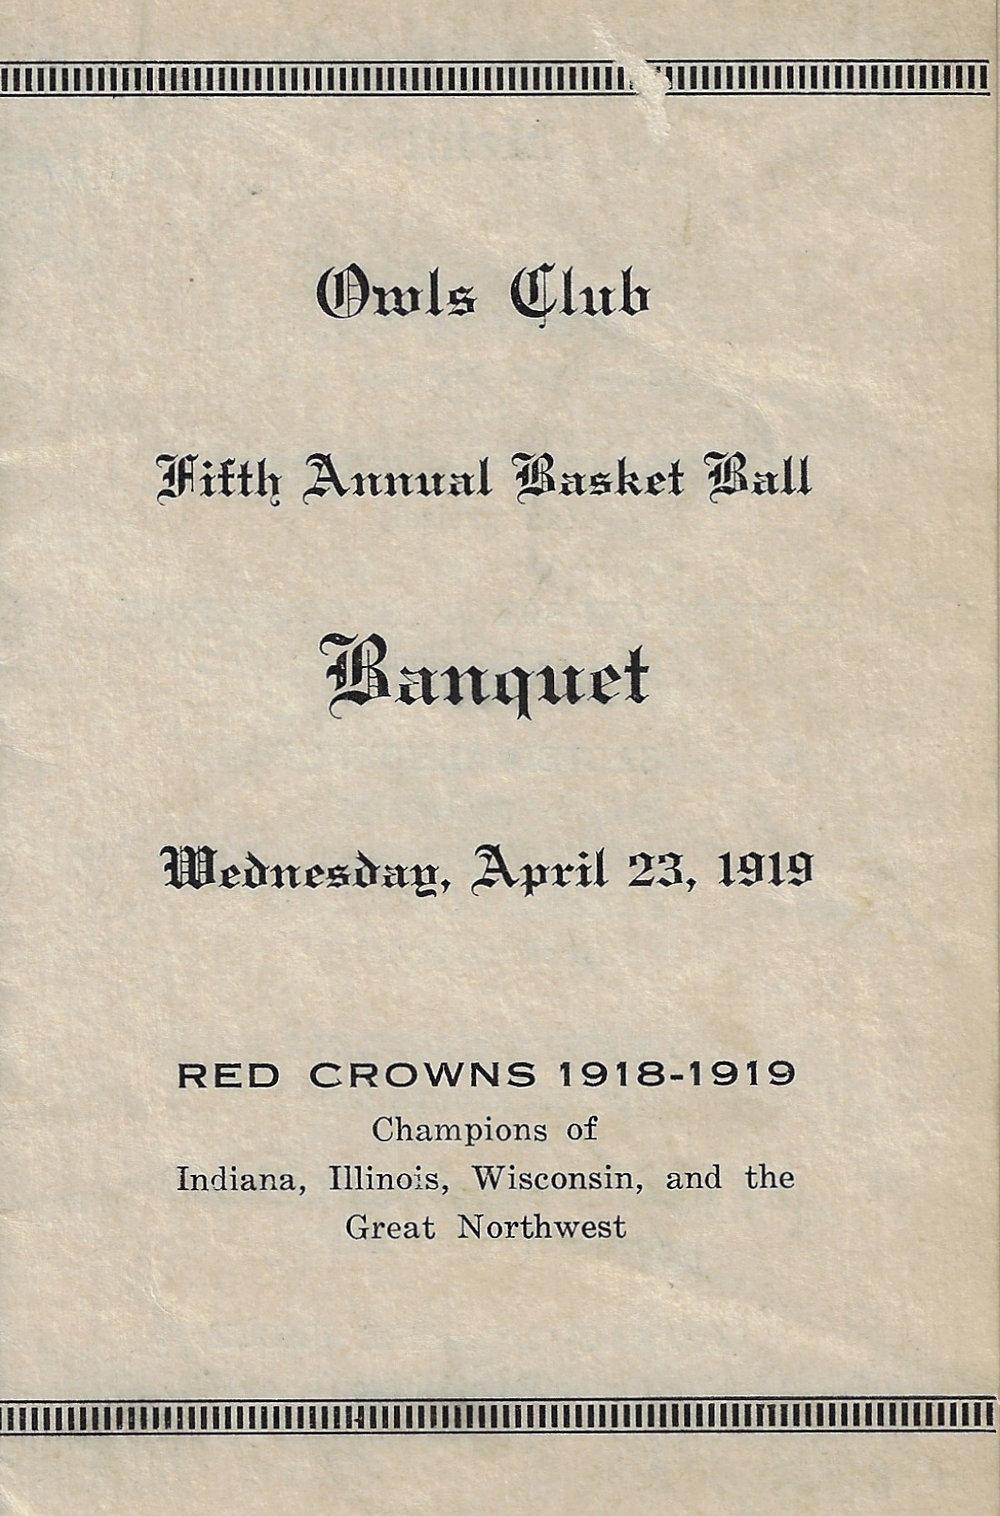 Owls Club Basketball Banquet -  1919.bmp.jpg